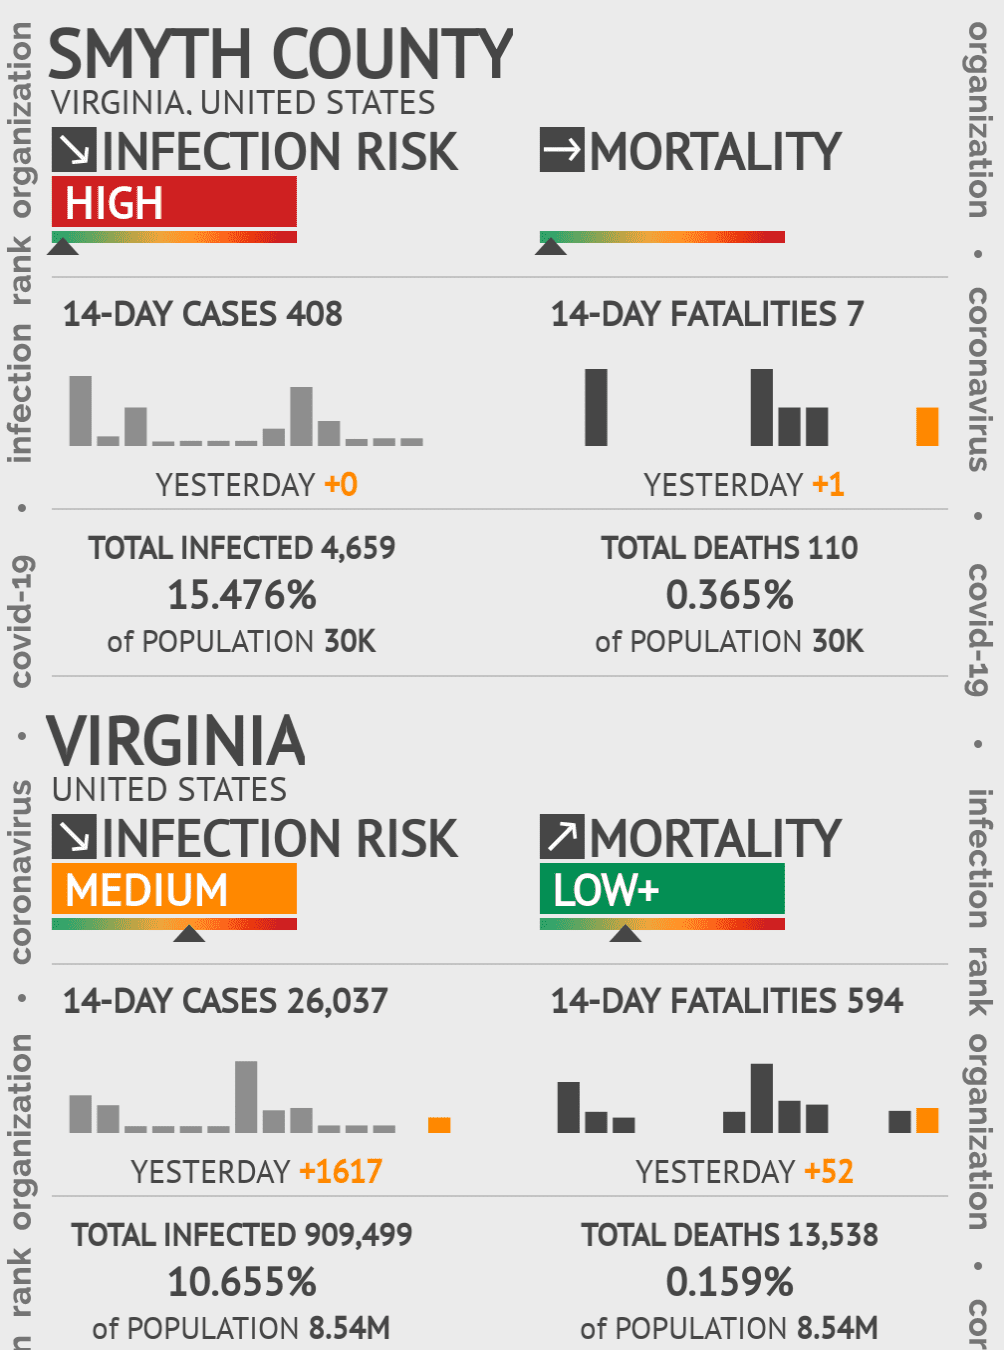 Smyth County Coronavirus Covid-19 Risk of Infection on July 24, 2021